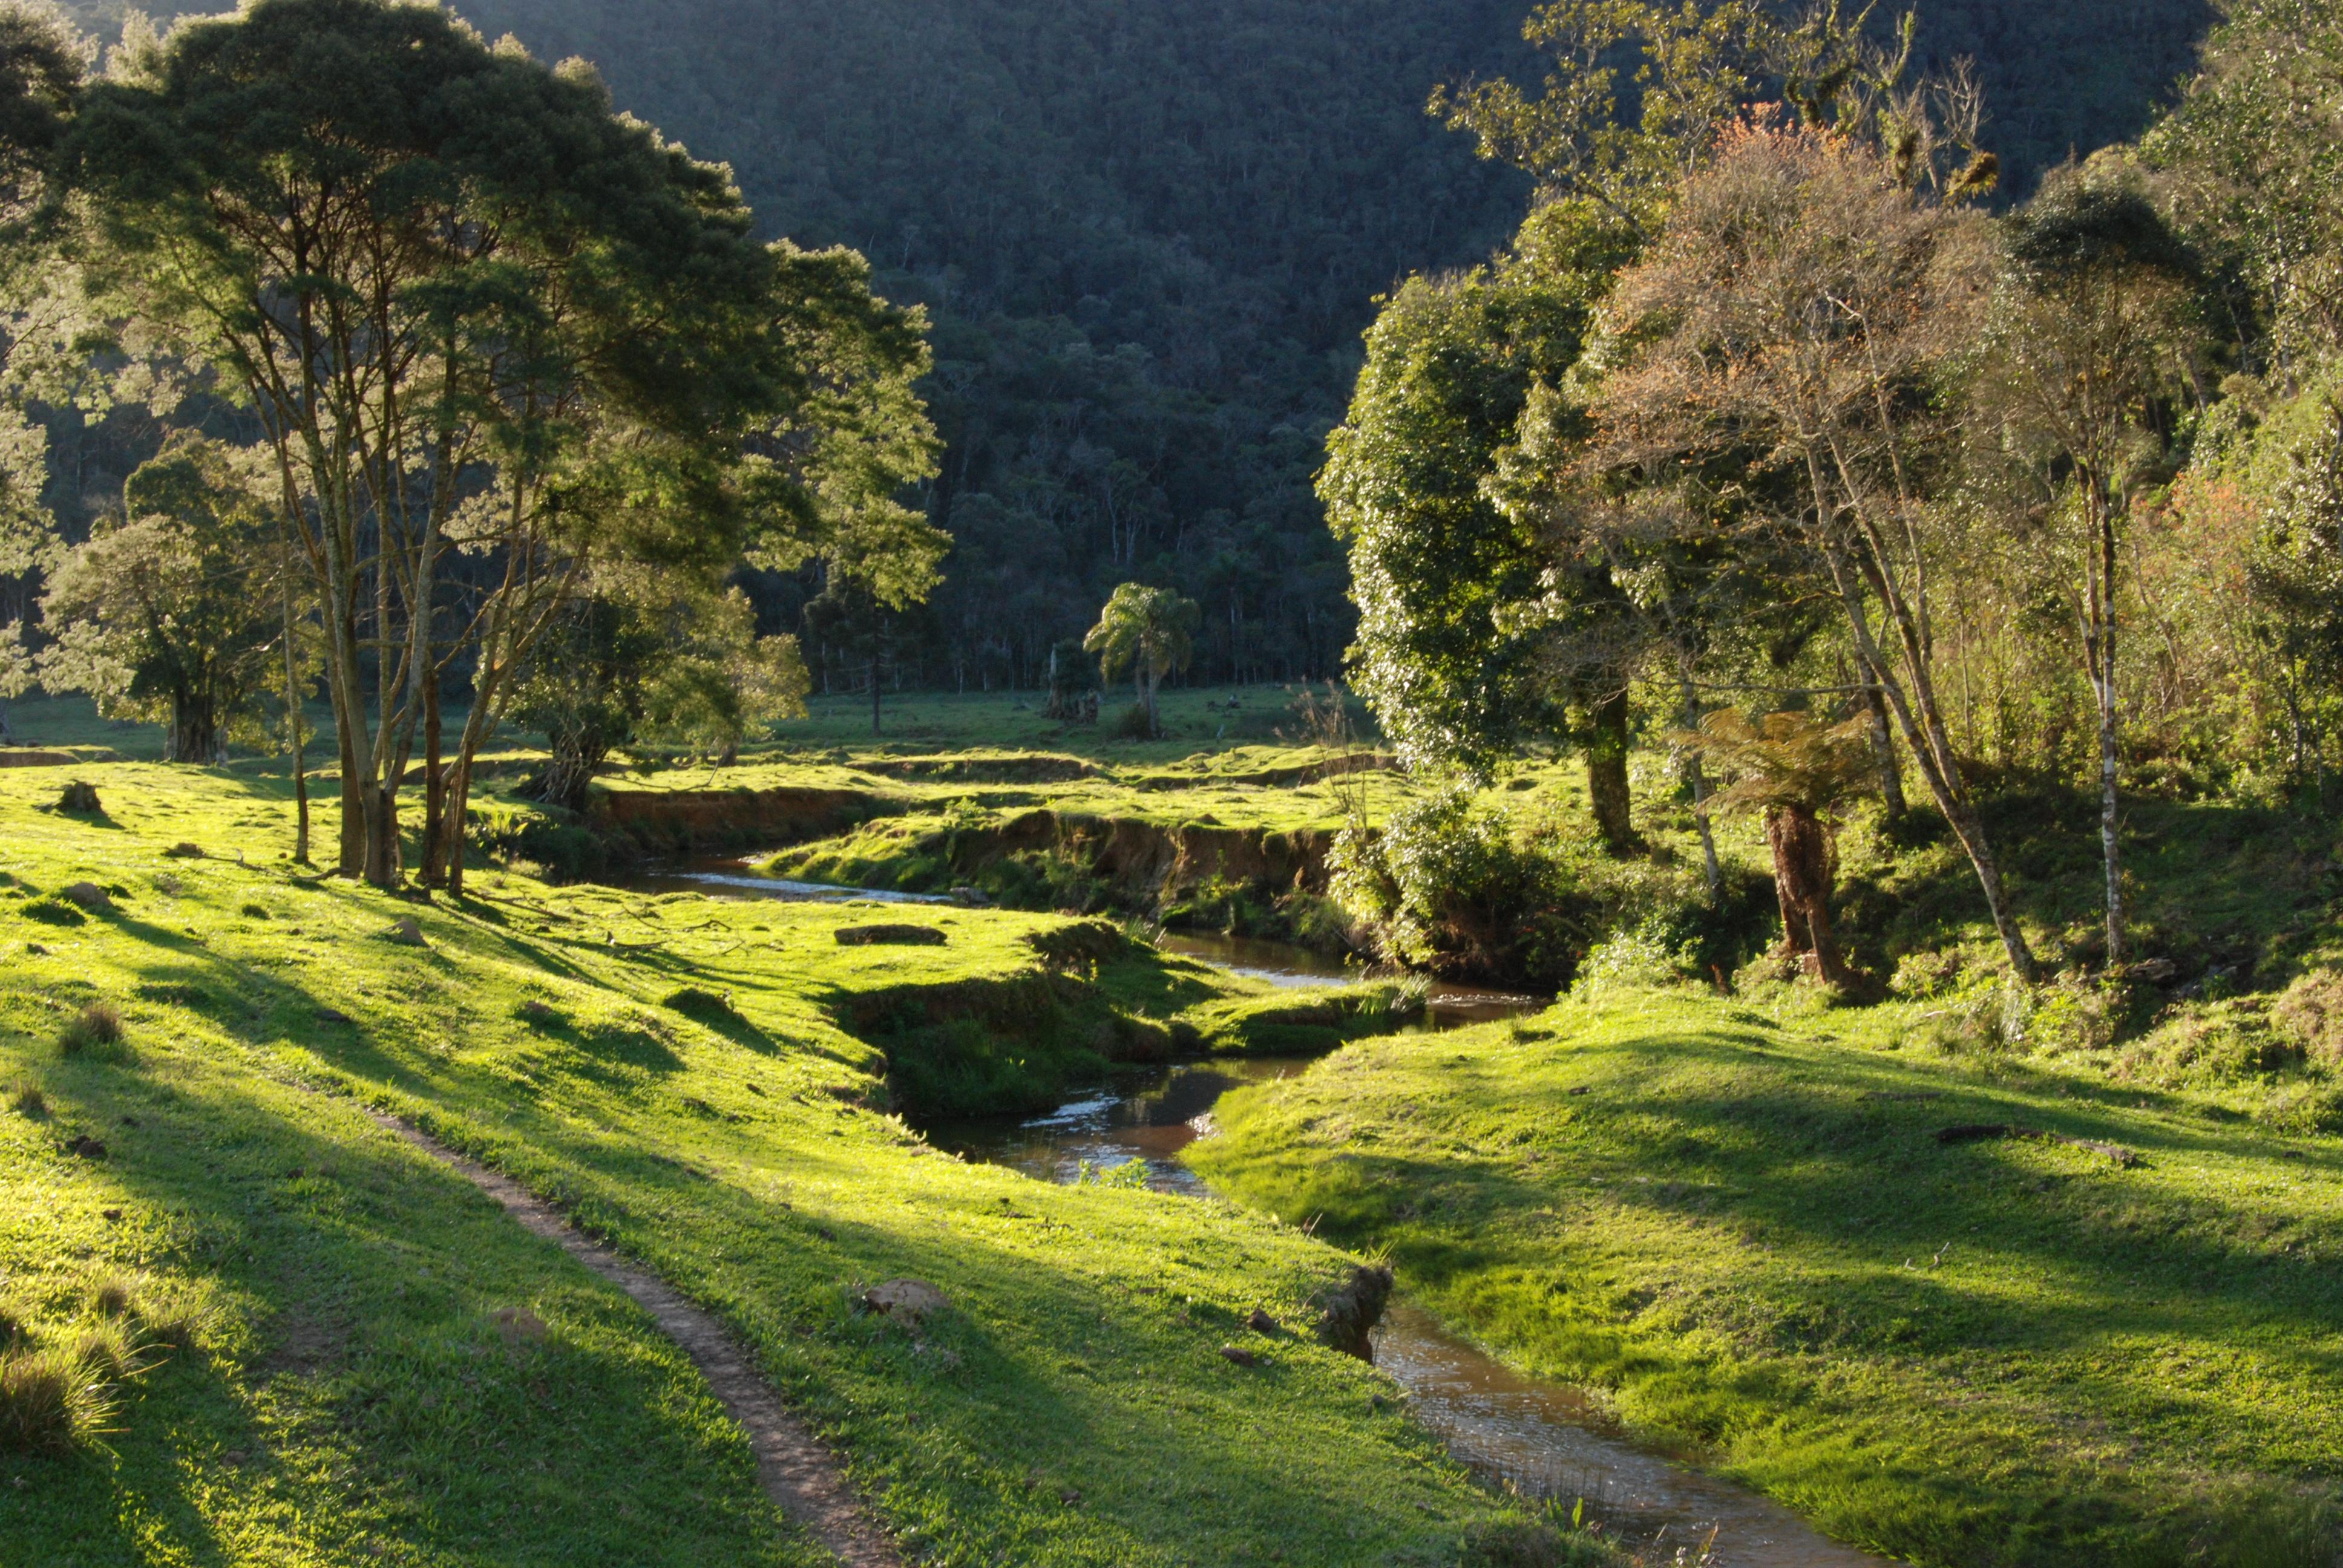 Parque Nacional da Serra do Itajaí. Foto: Cristian Janke